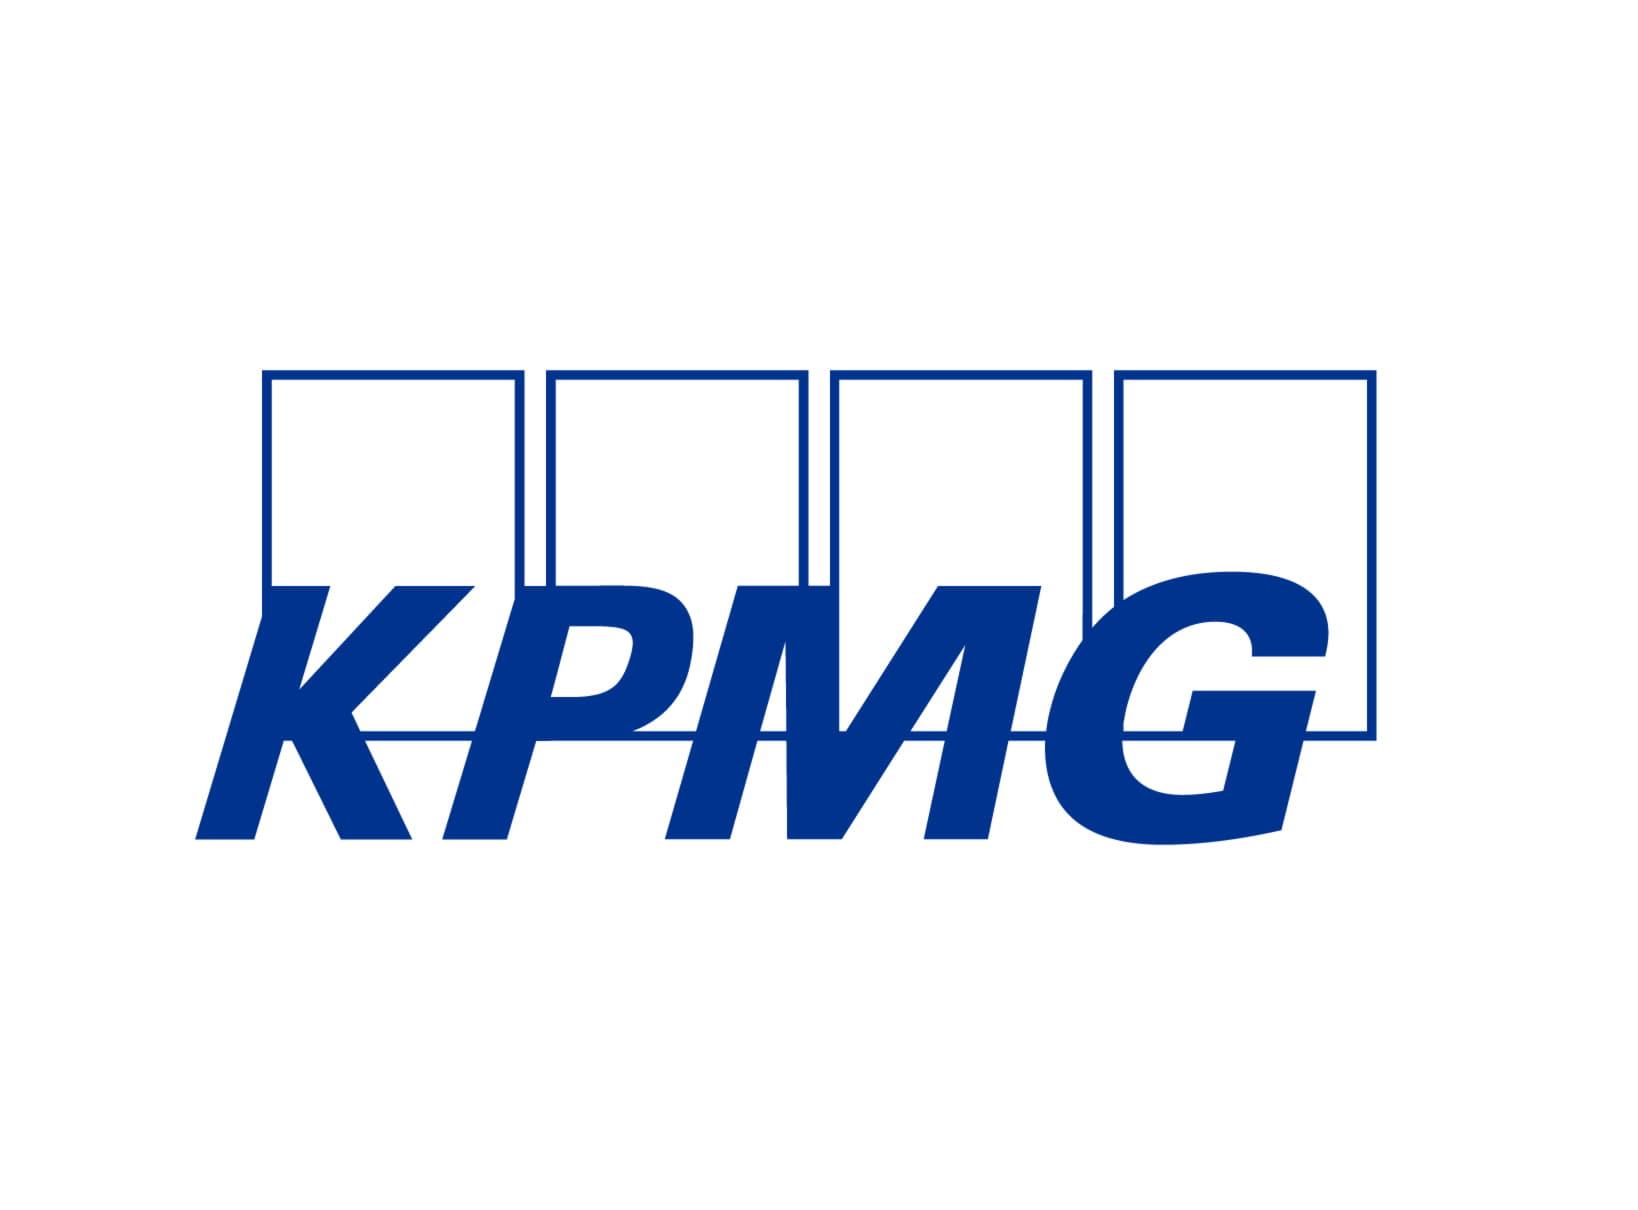 mitglieder-logos/1000000132_KPMG_NoCP_RGB.jpg